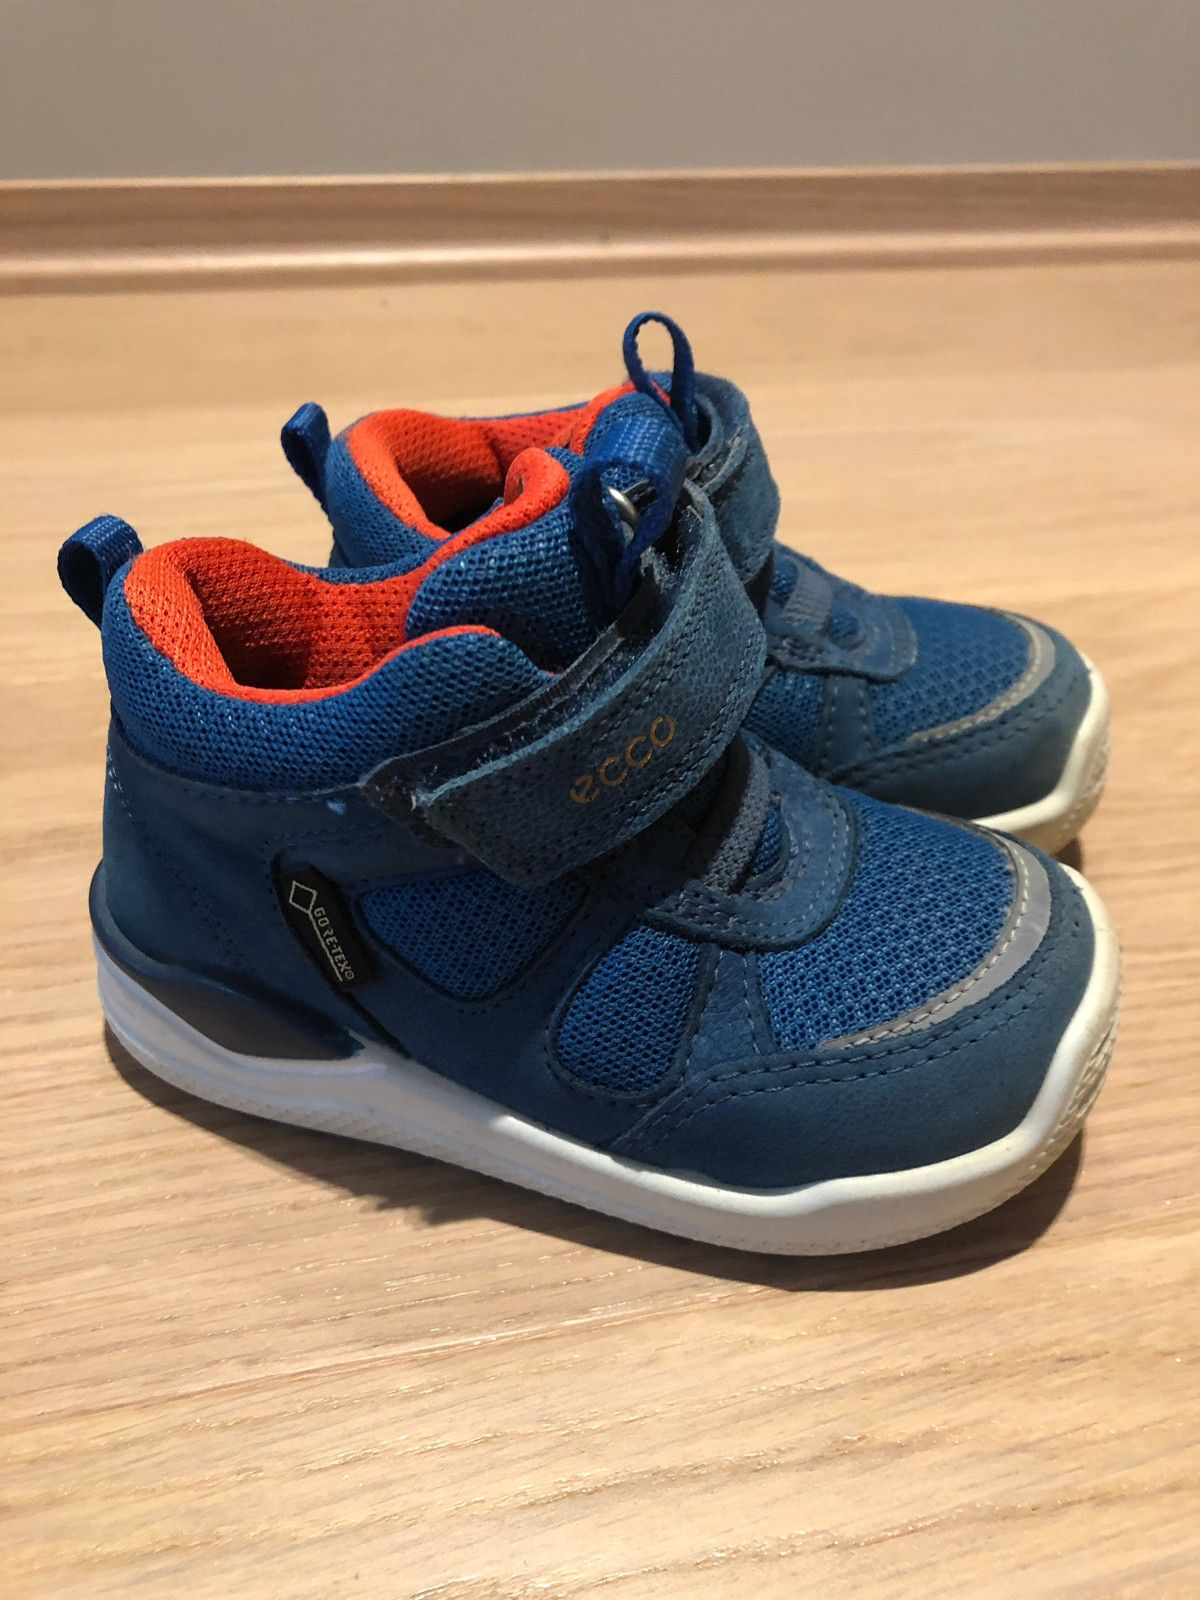 Ecco Goretex sko str 21 knapt brukt | FINN.no